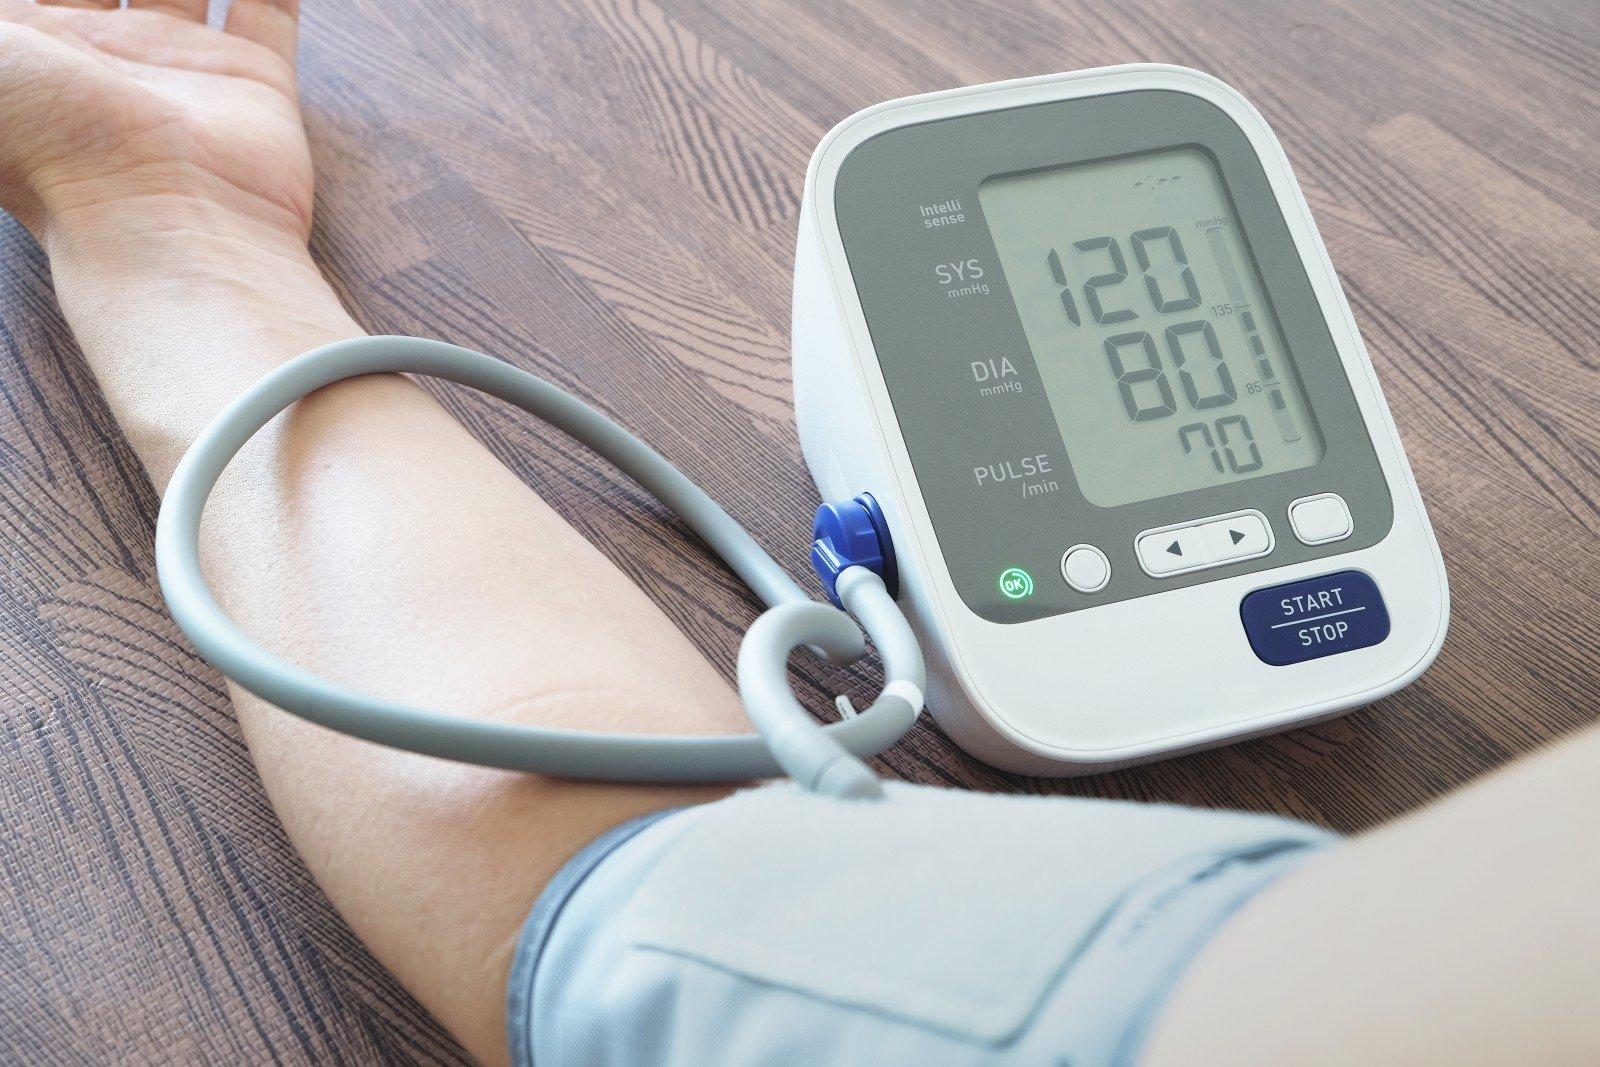 hipertenzija yra paveldima liga ar ne